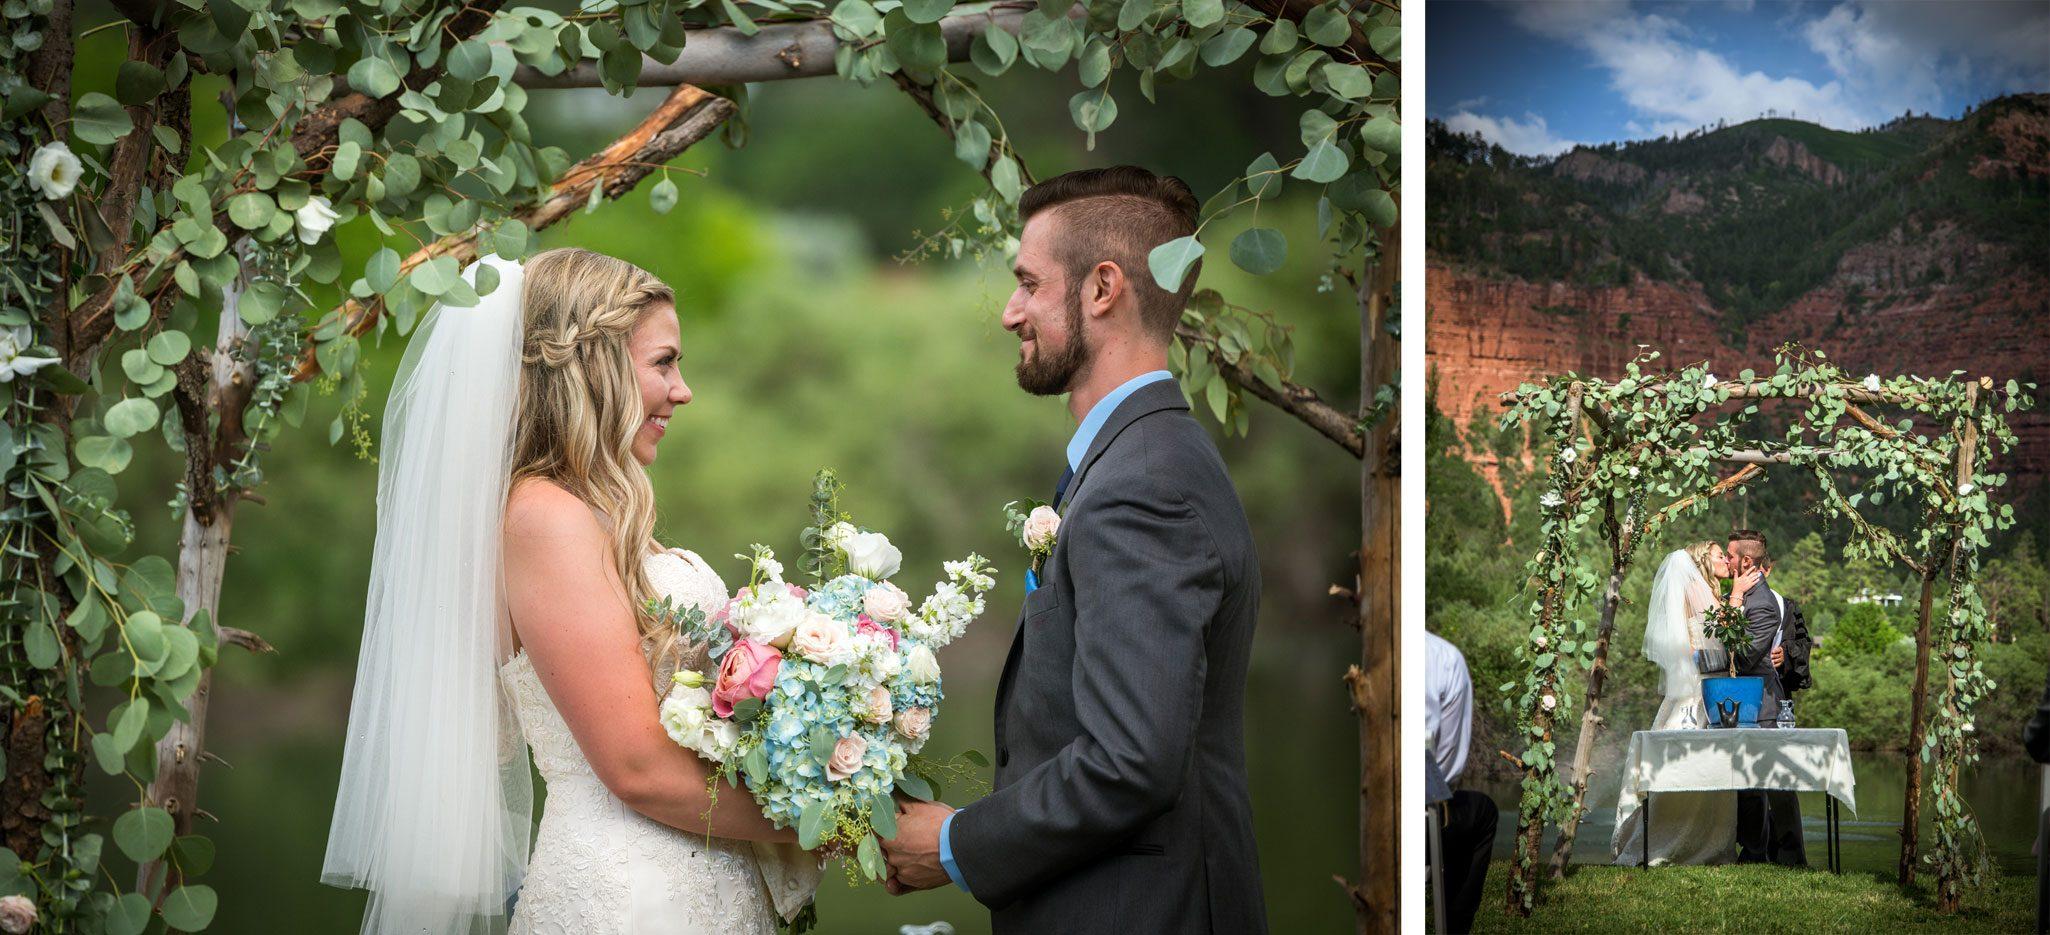 Ceremony   Weddings at River Bend Ranch, Durango